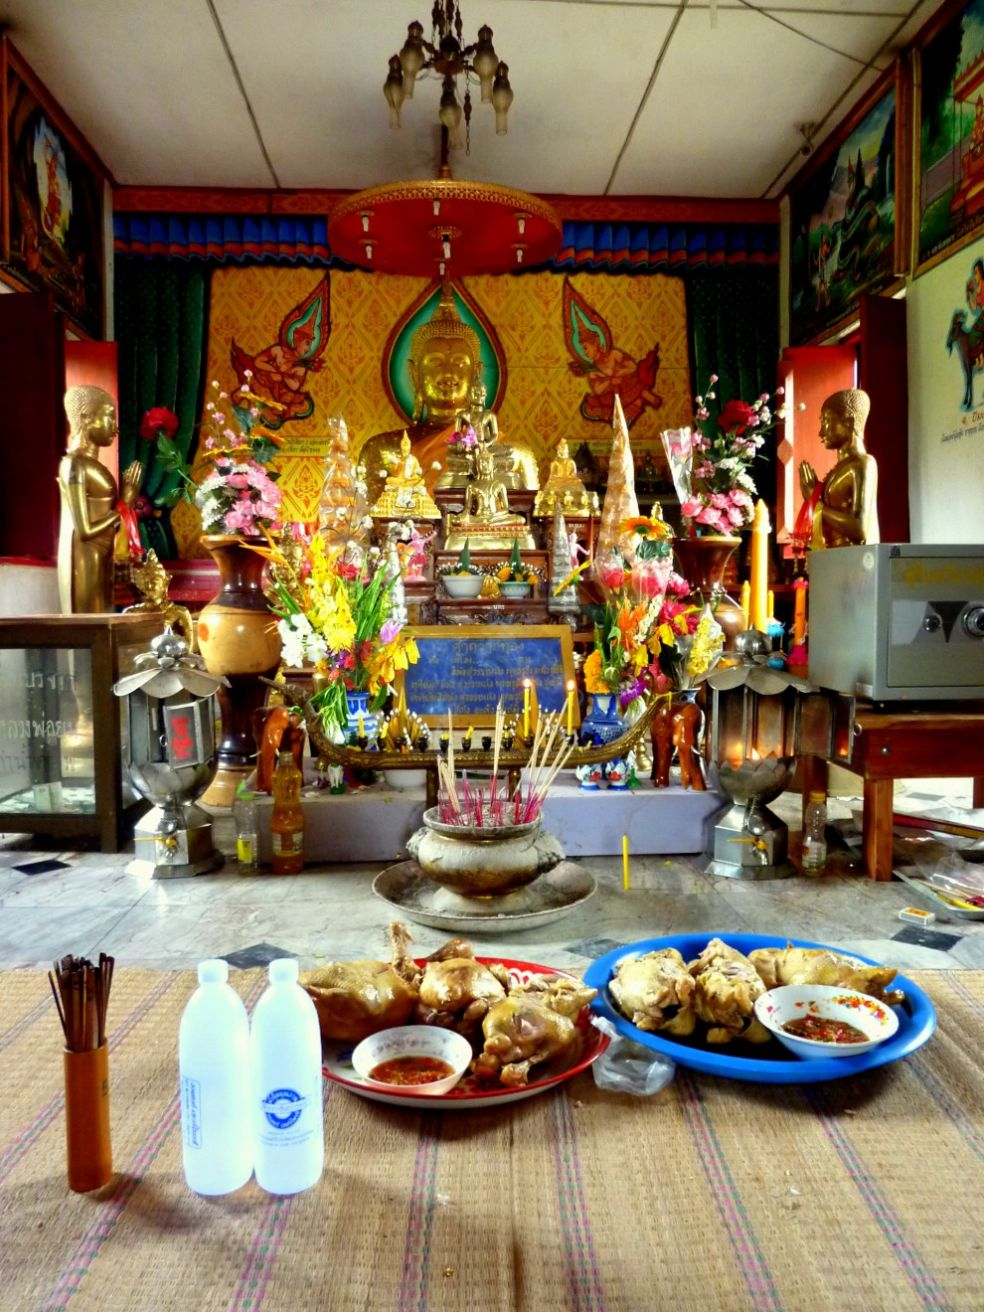 Цыплята и суп из лапши в храме Таиланда